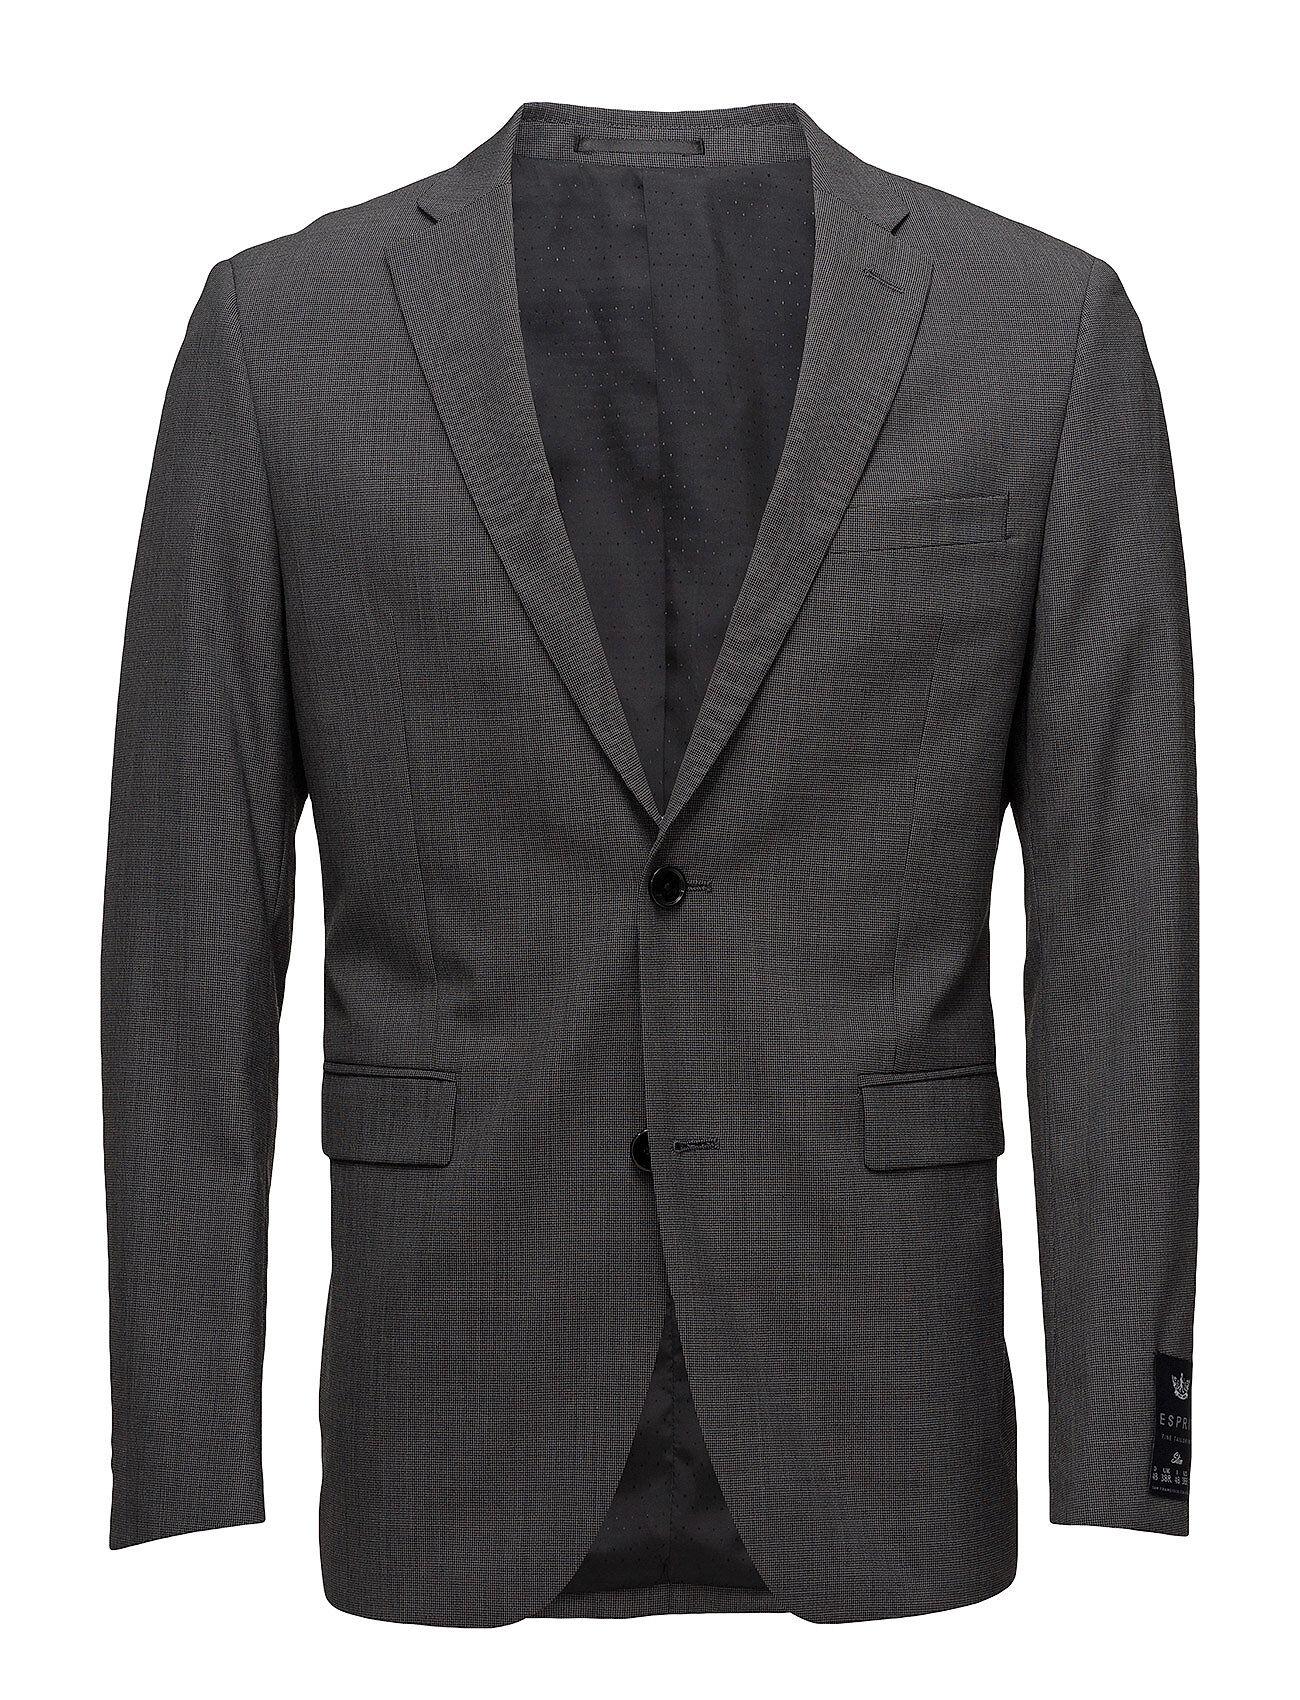 Image of Esprit Collection Blazers Suit Bleiseri Puvun Takki Harmaa Esprit Collection